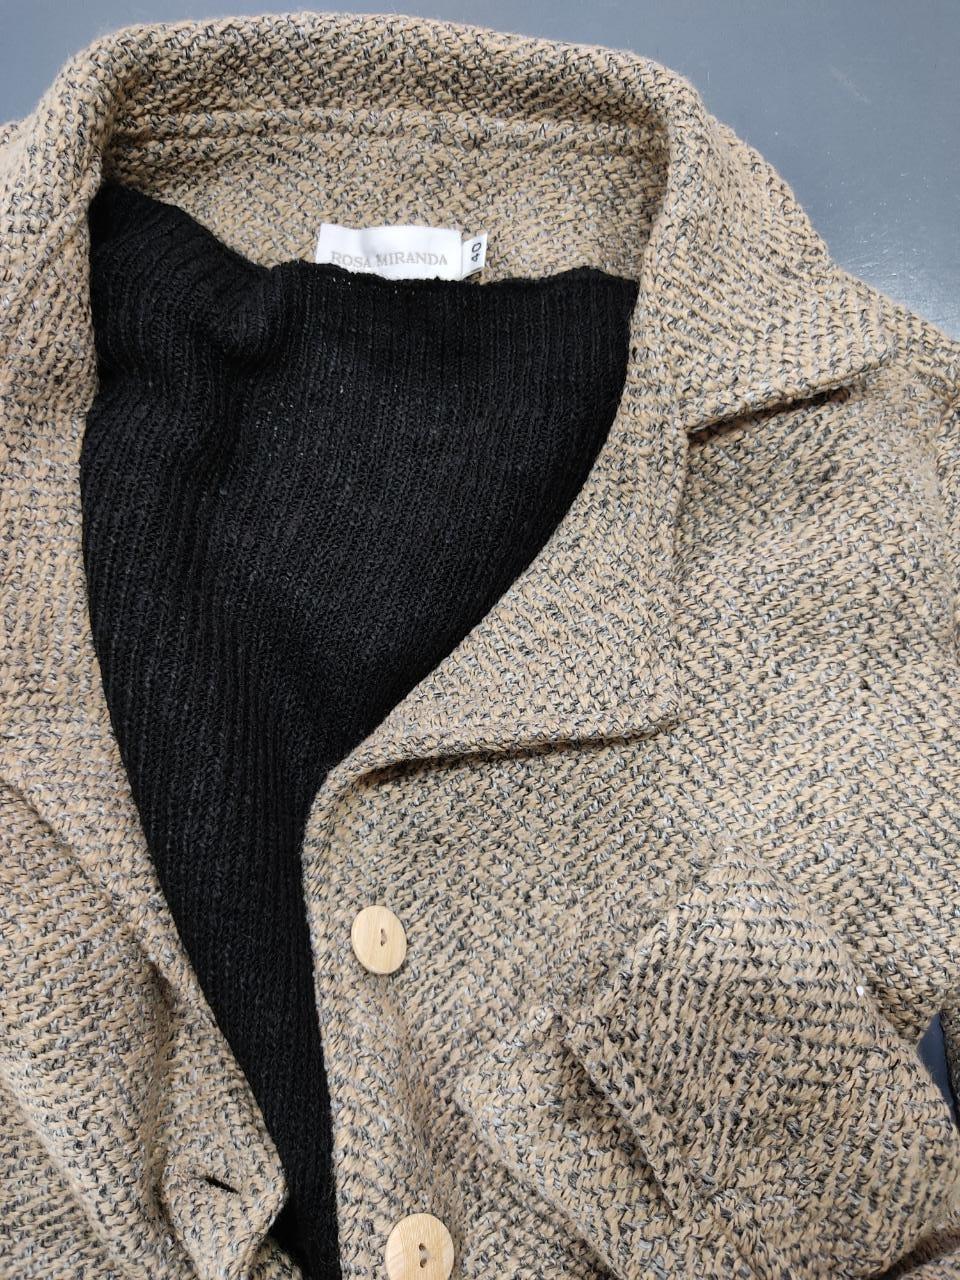 Pull tricot canelado gola baixa